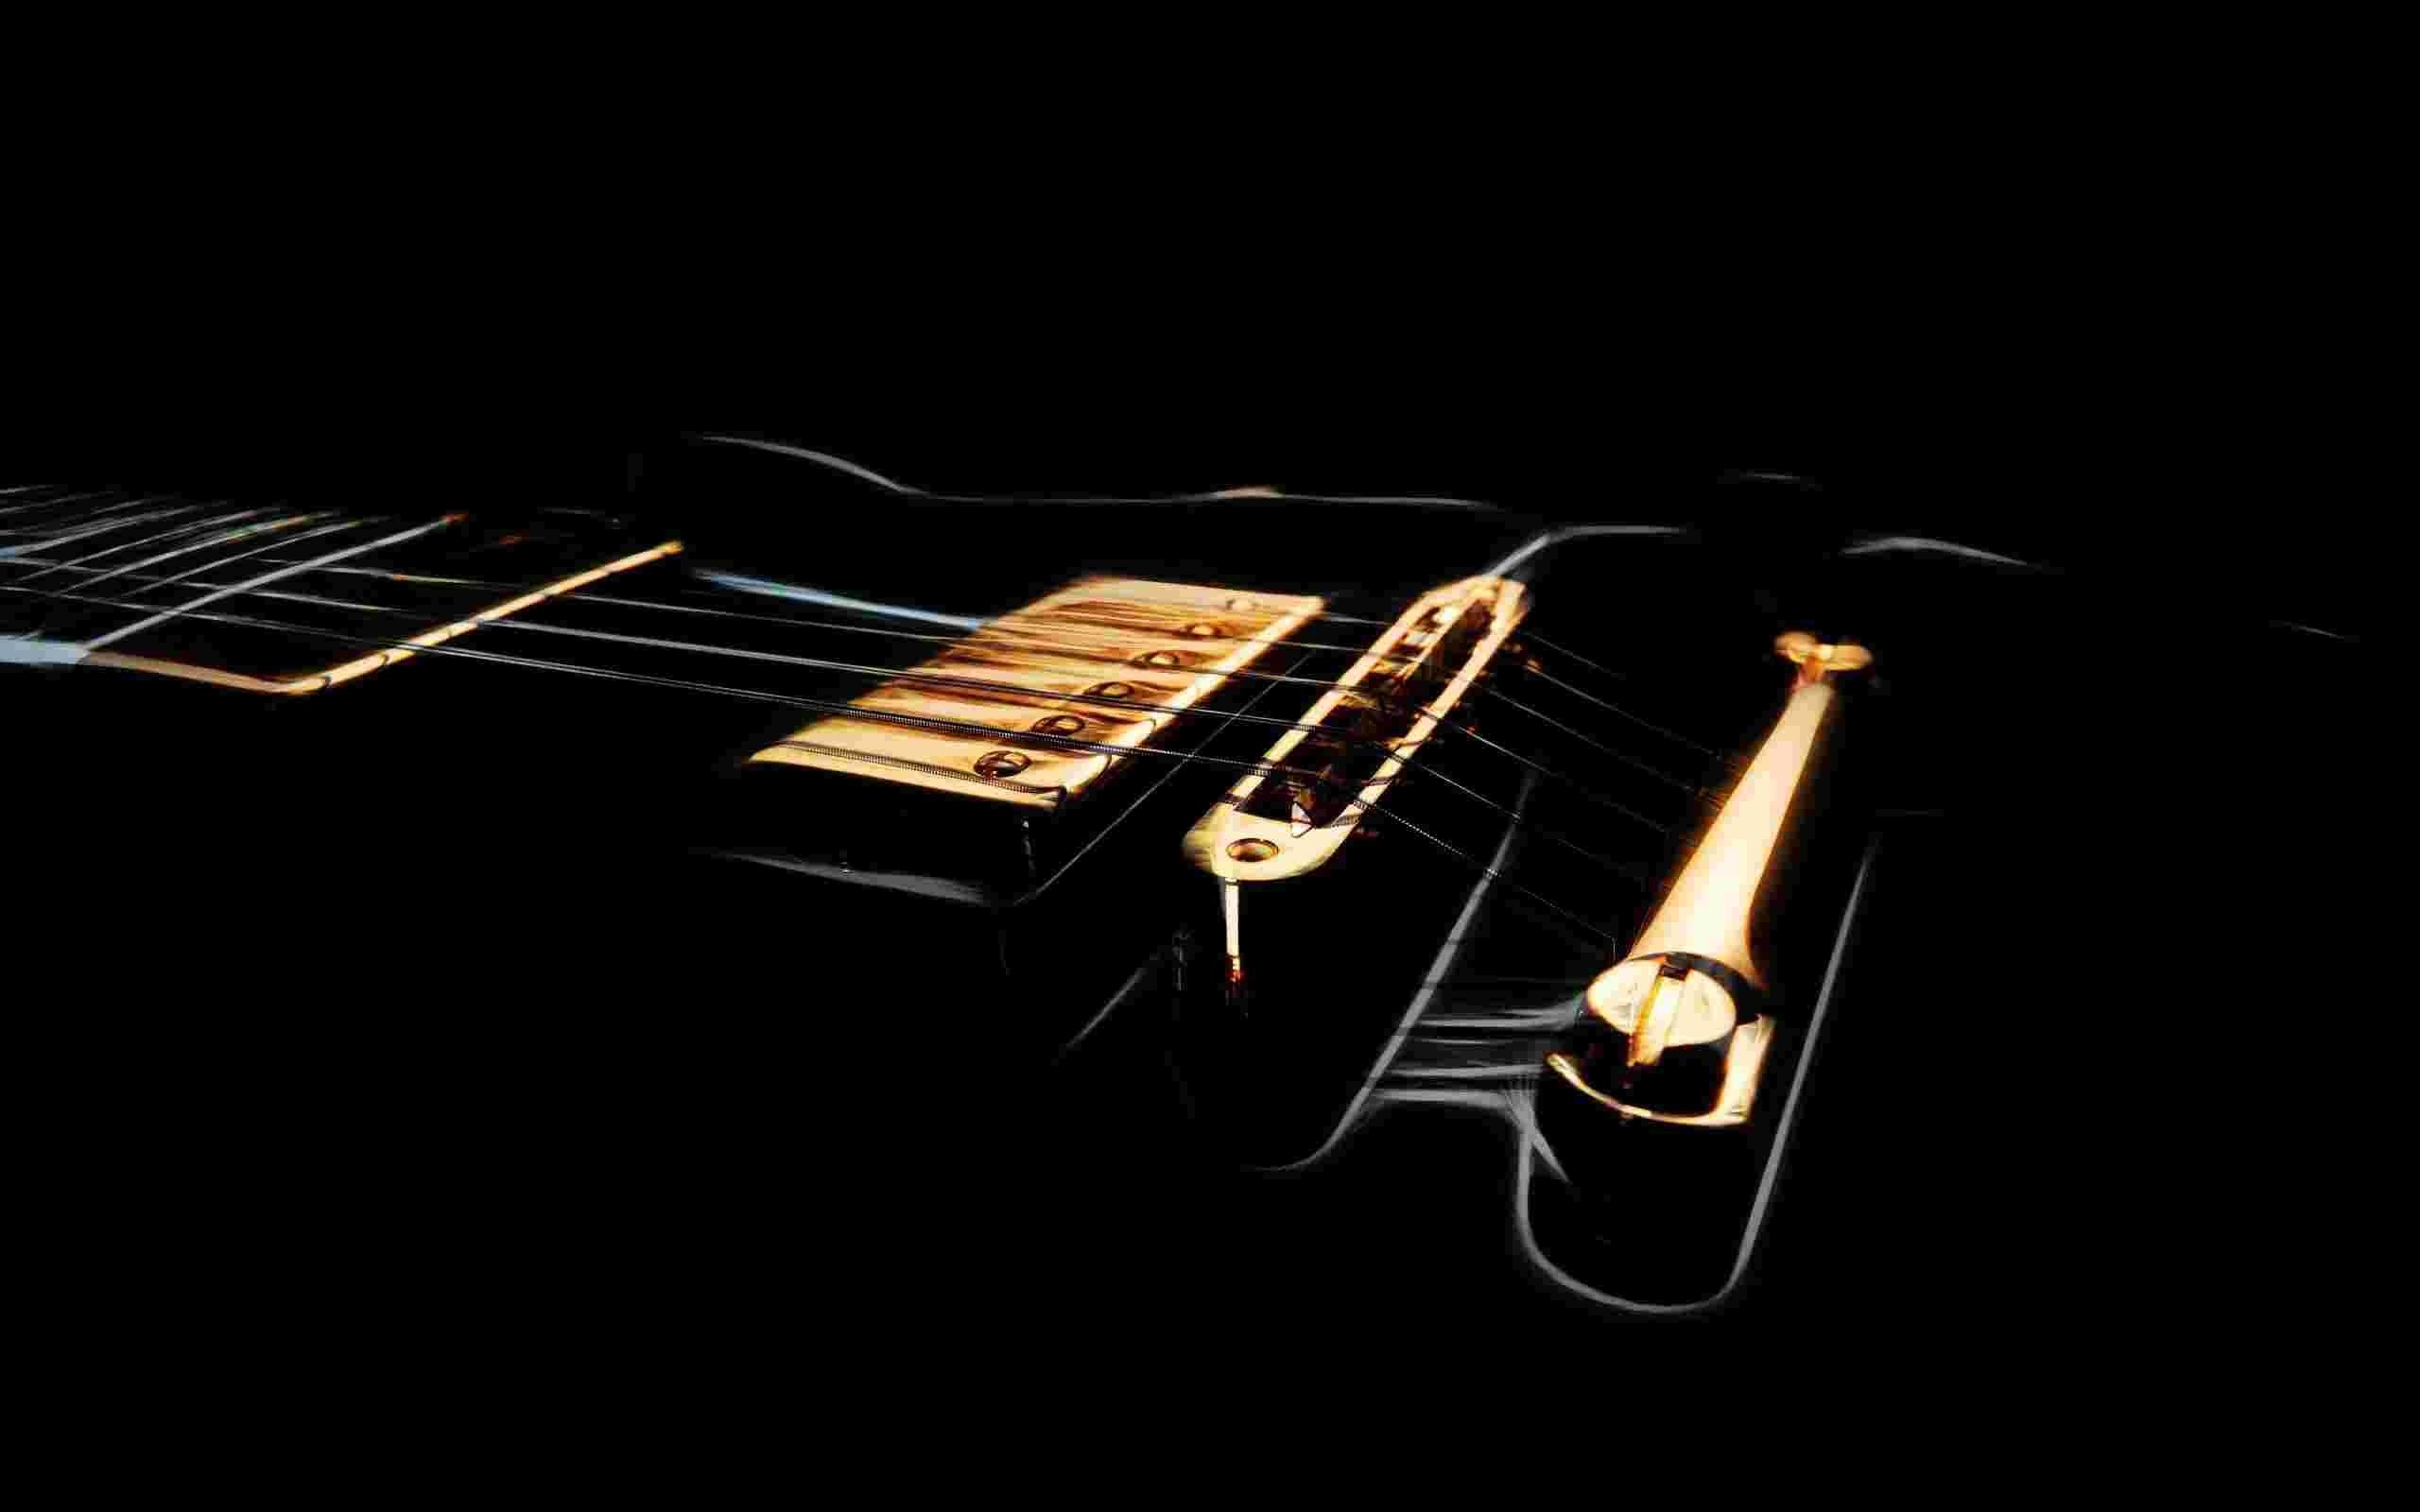 Fender Wallpaper High Resolution – WallpaperSafari